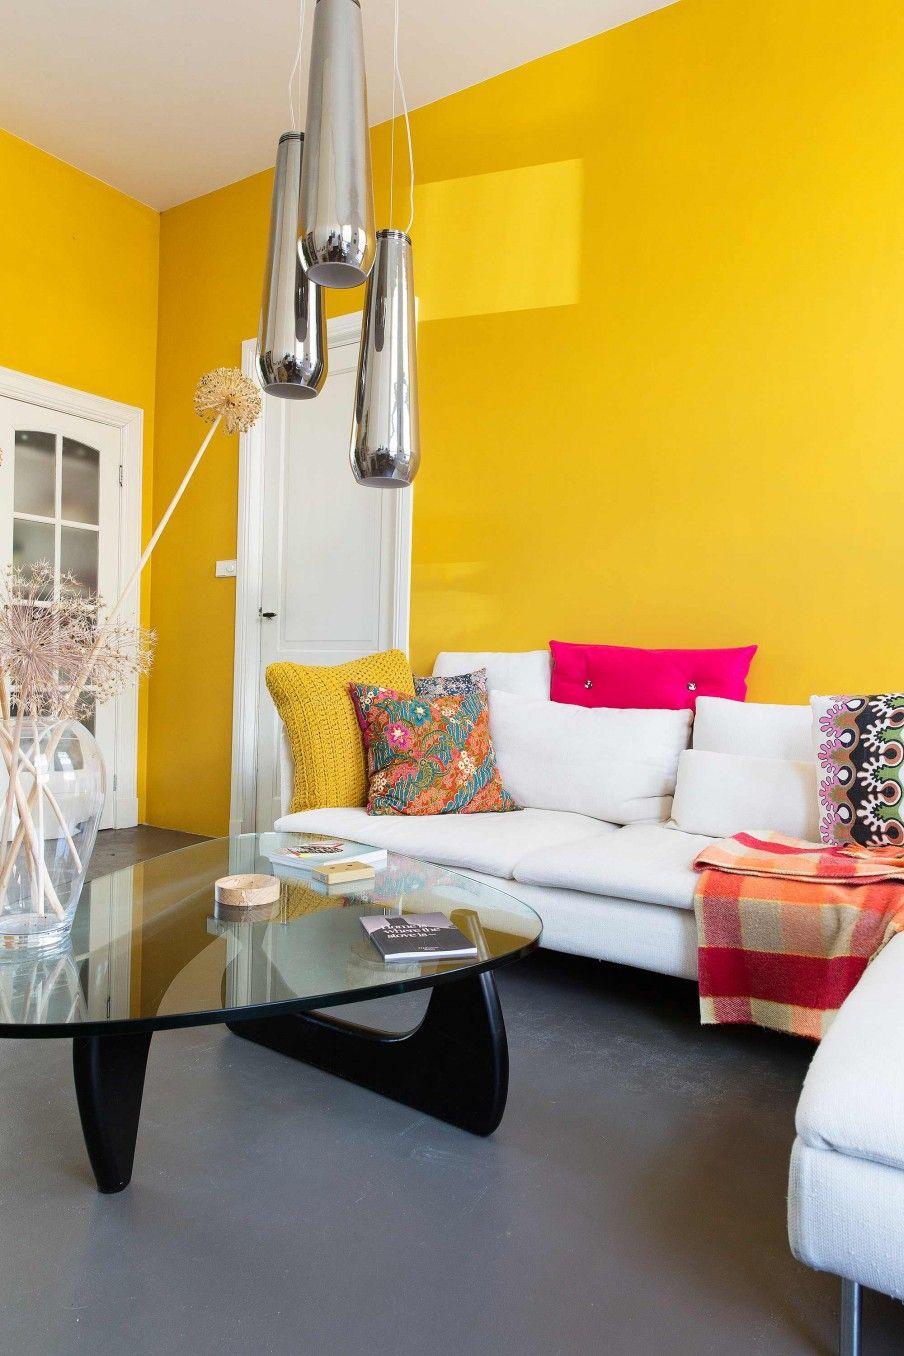 gele wand woonkamer | yellow wall livingroom | vtwonen 11-2016 ...